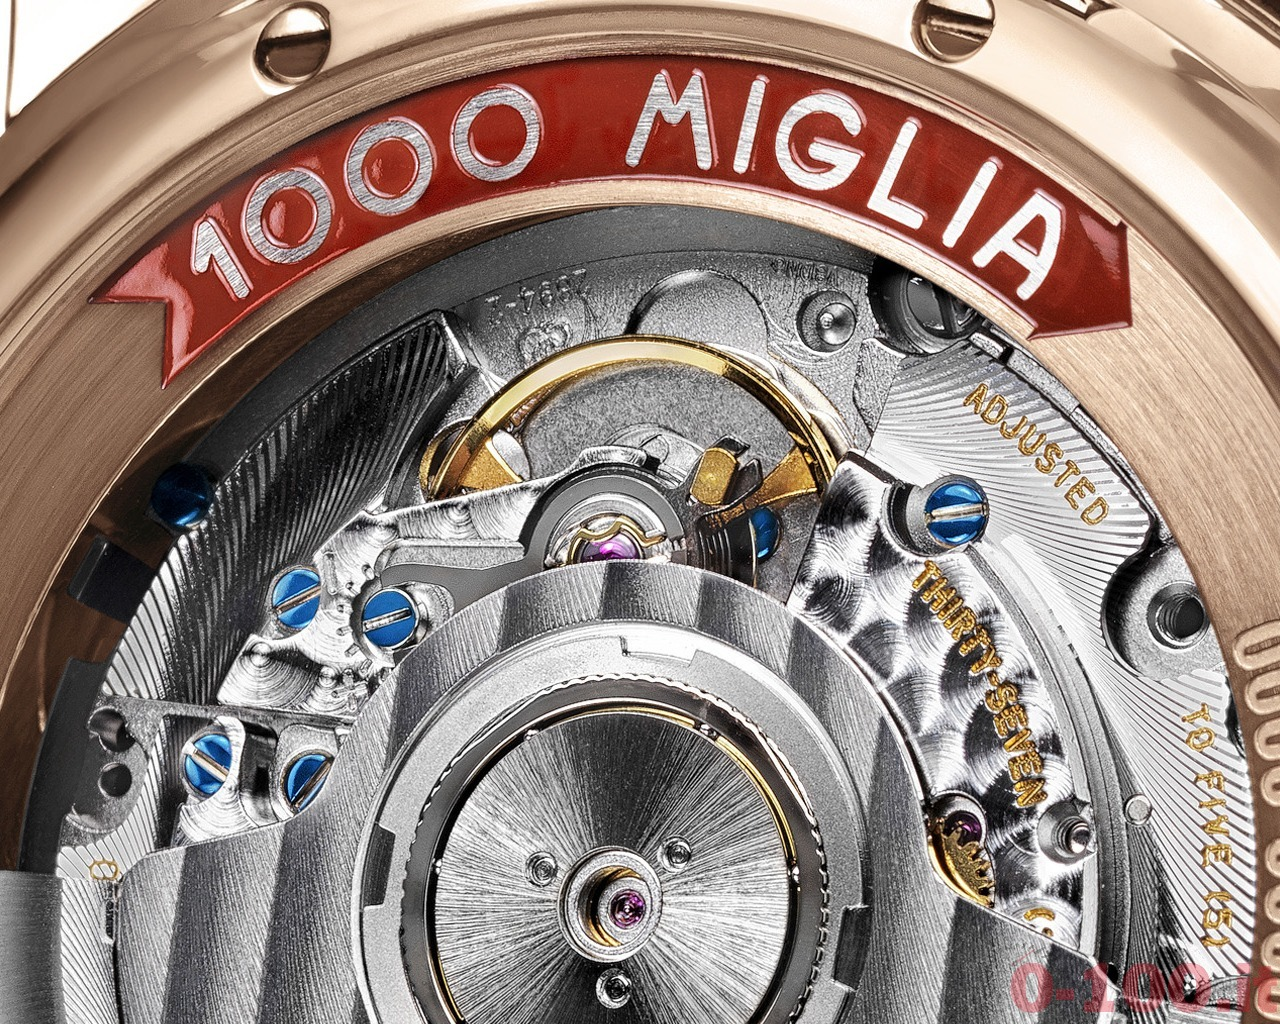 chopard-mille-miglia-2014-ref-168511-3036-ref-161274-5006_0-1006